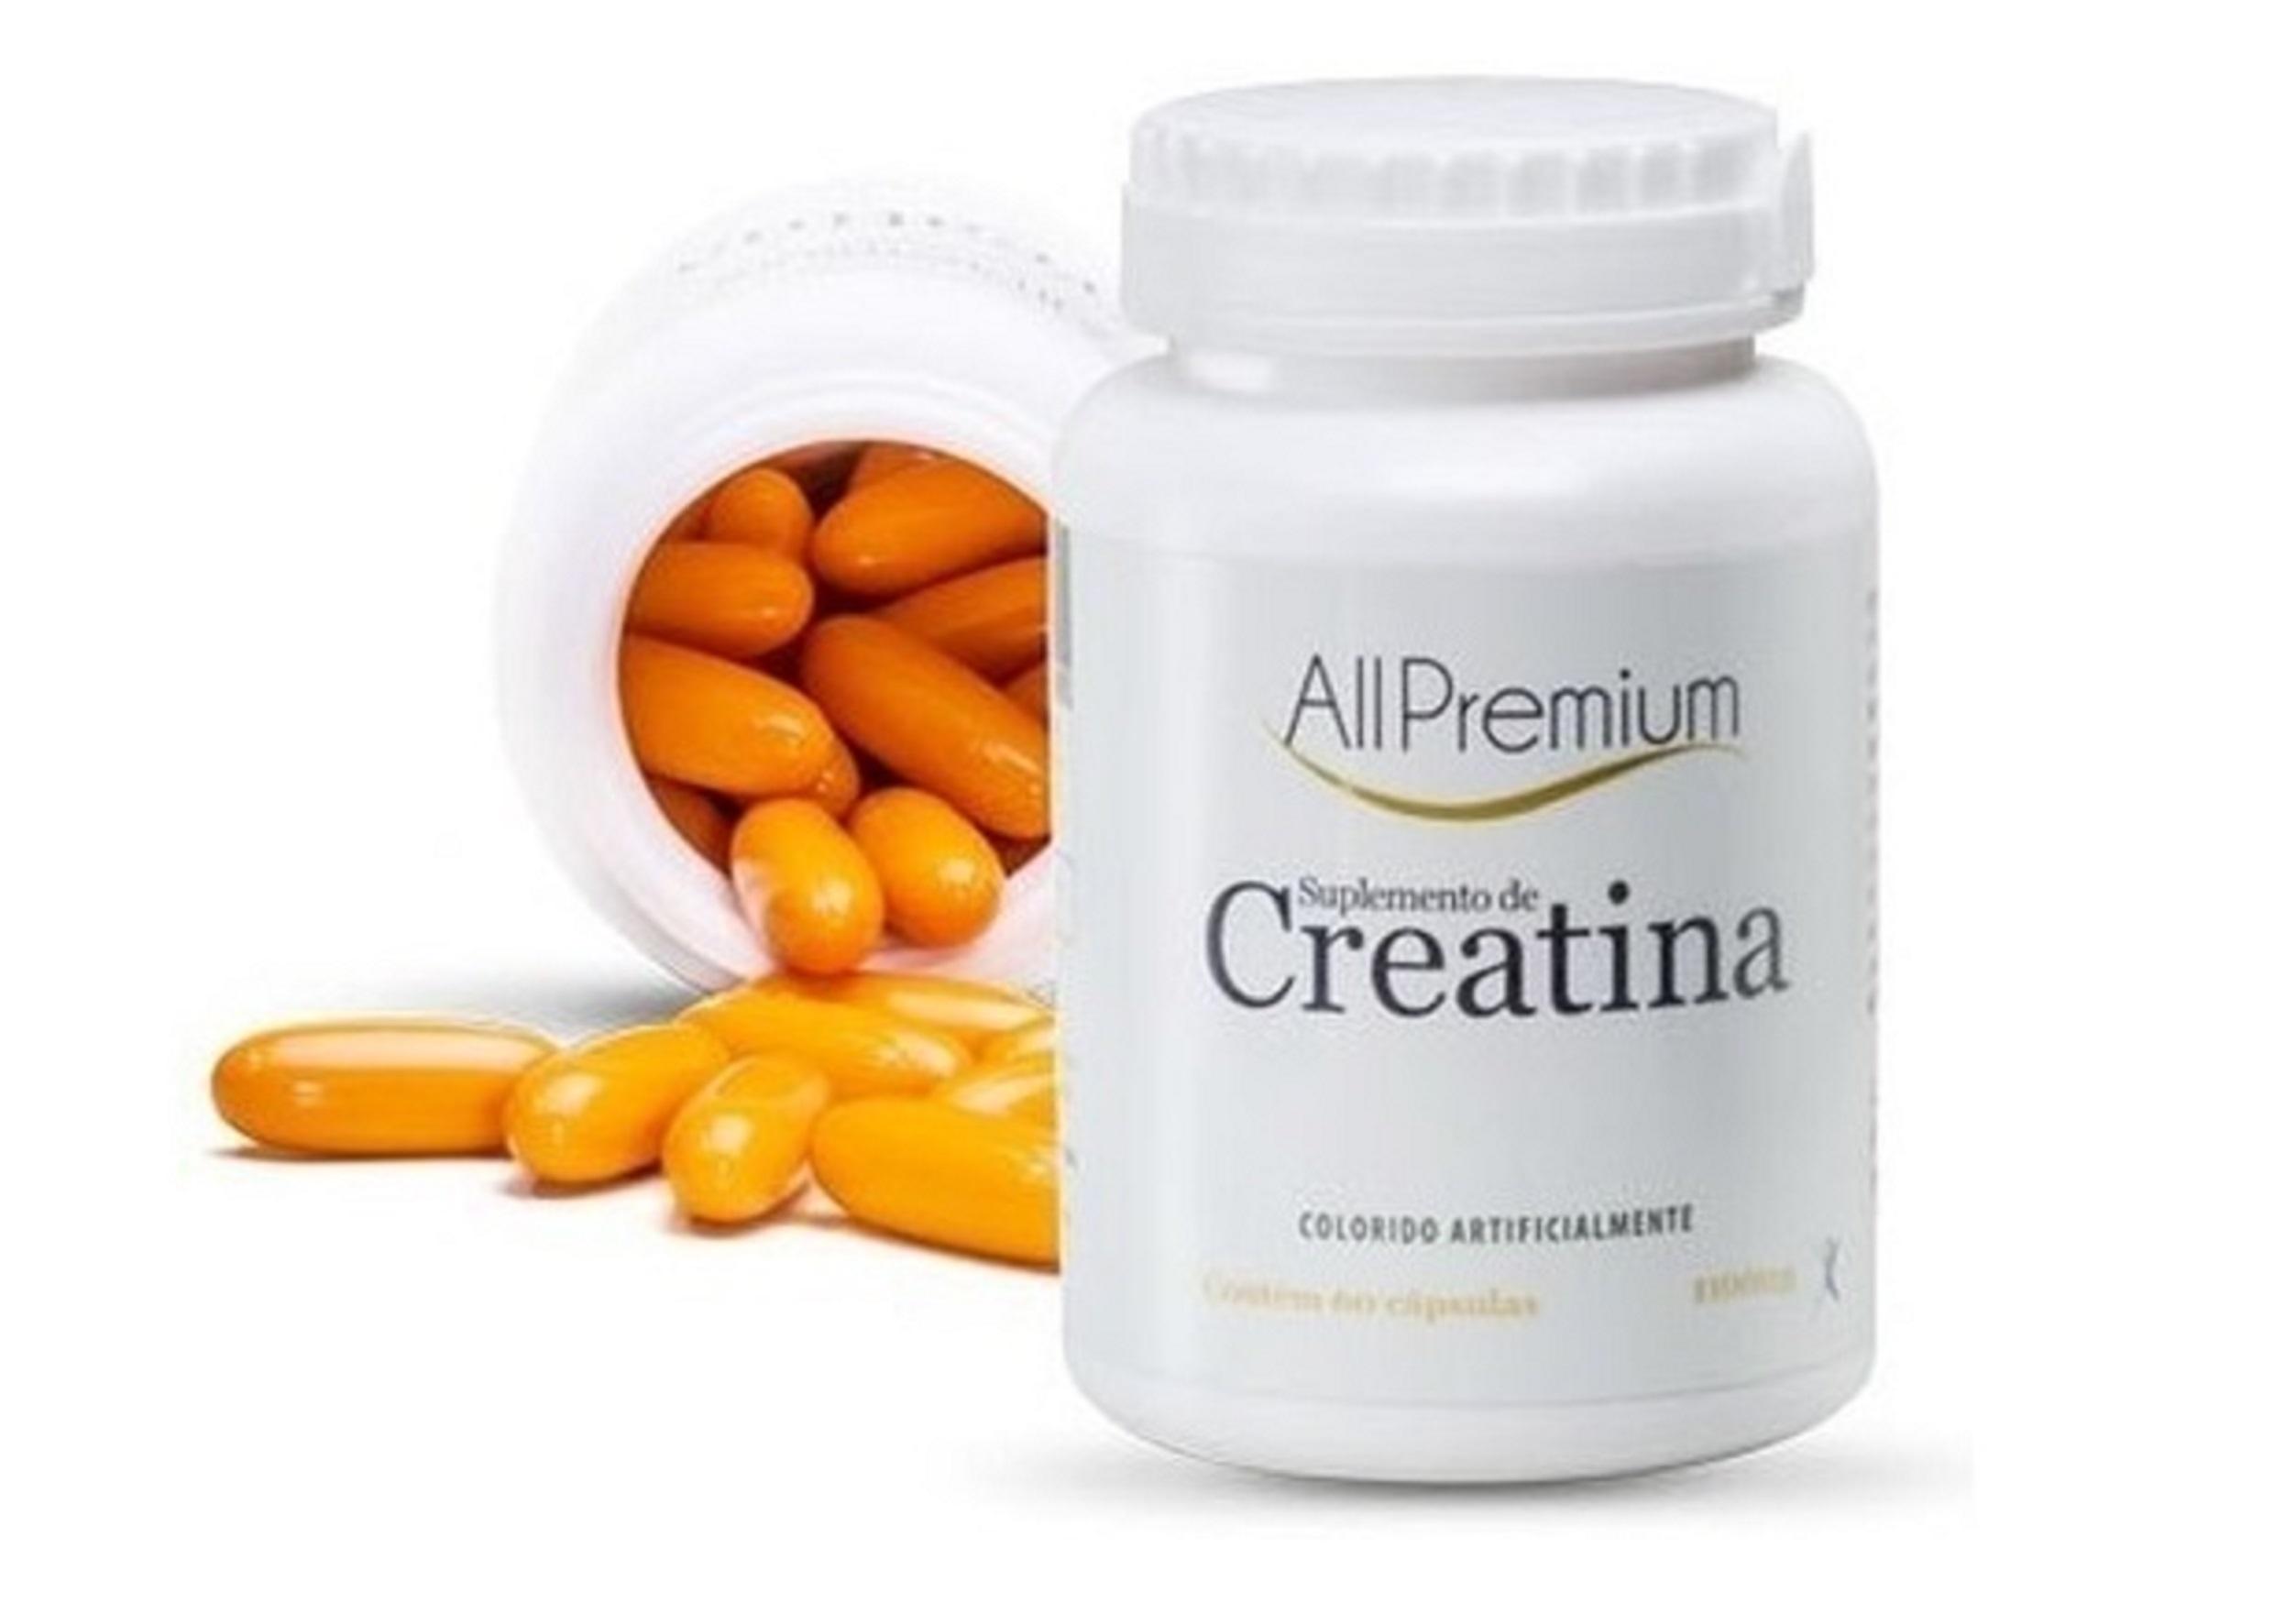 https://www.farmacianovahera.com.br/view/_upload/produto/61/1590090681creatina-ii.jpg